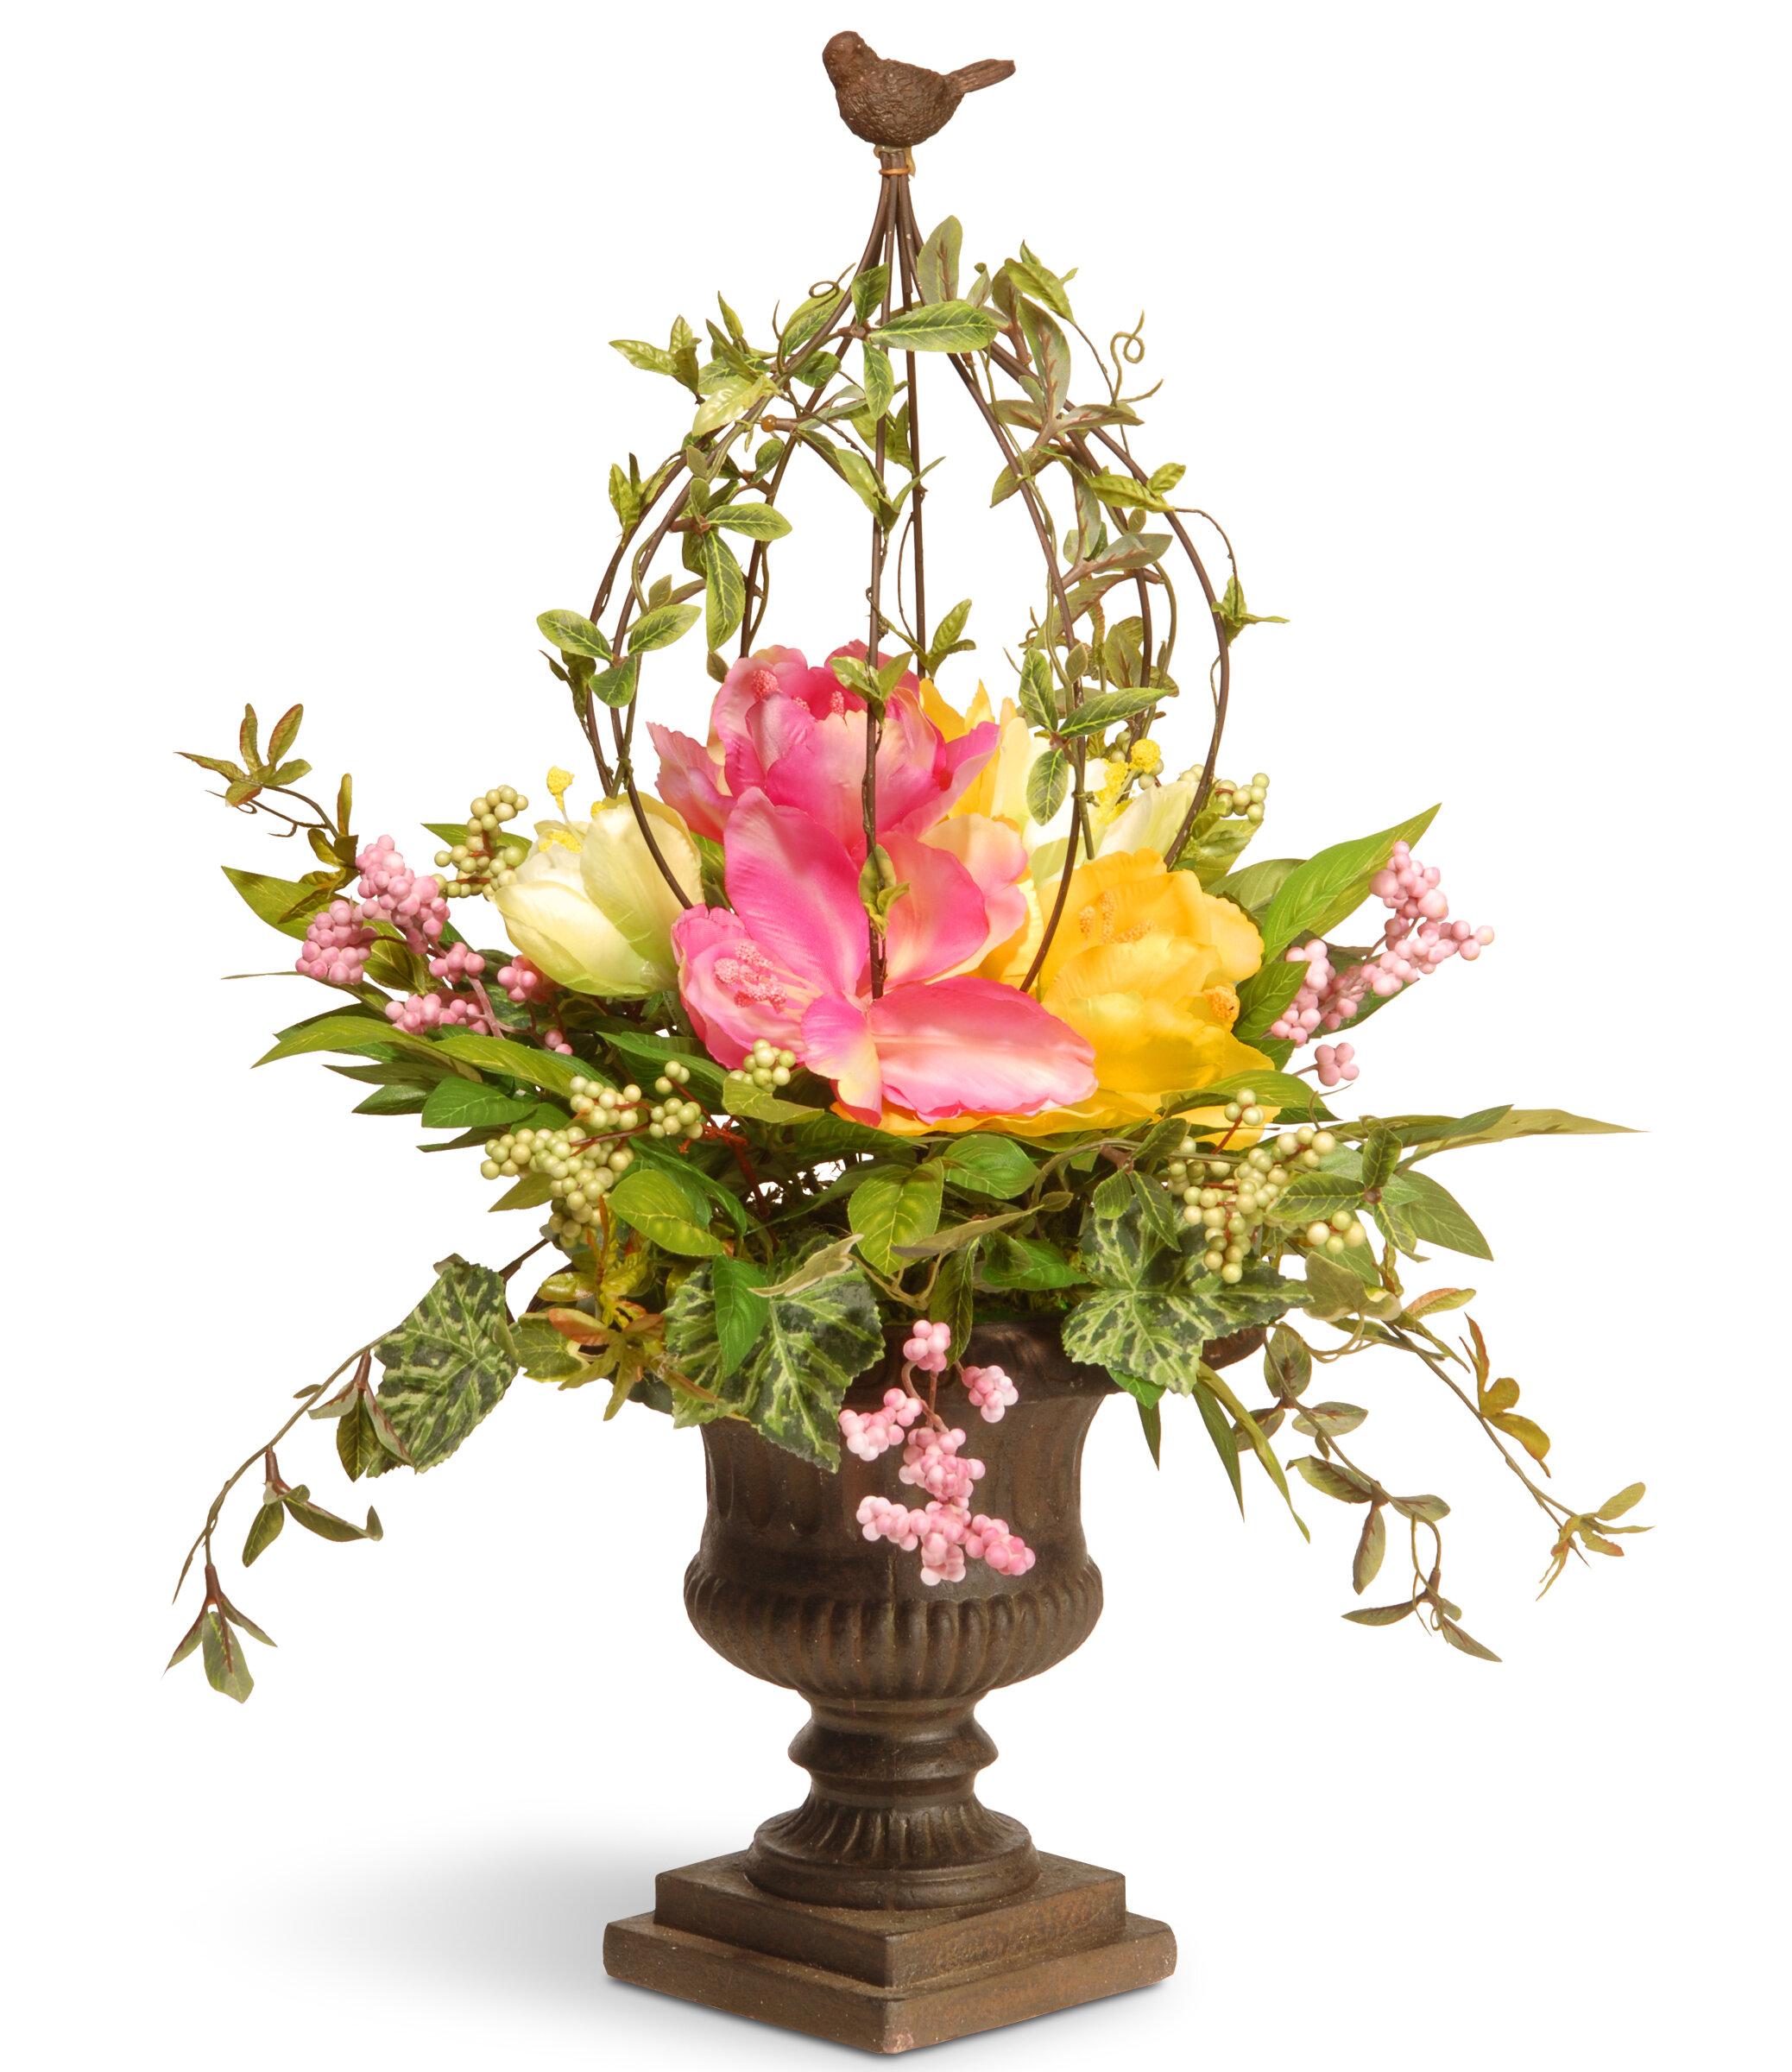 National Tree Co Spring Bird Cage Flower Floral Arrangements